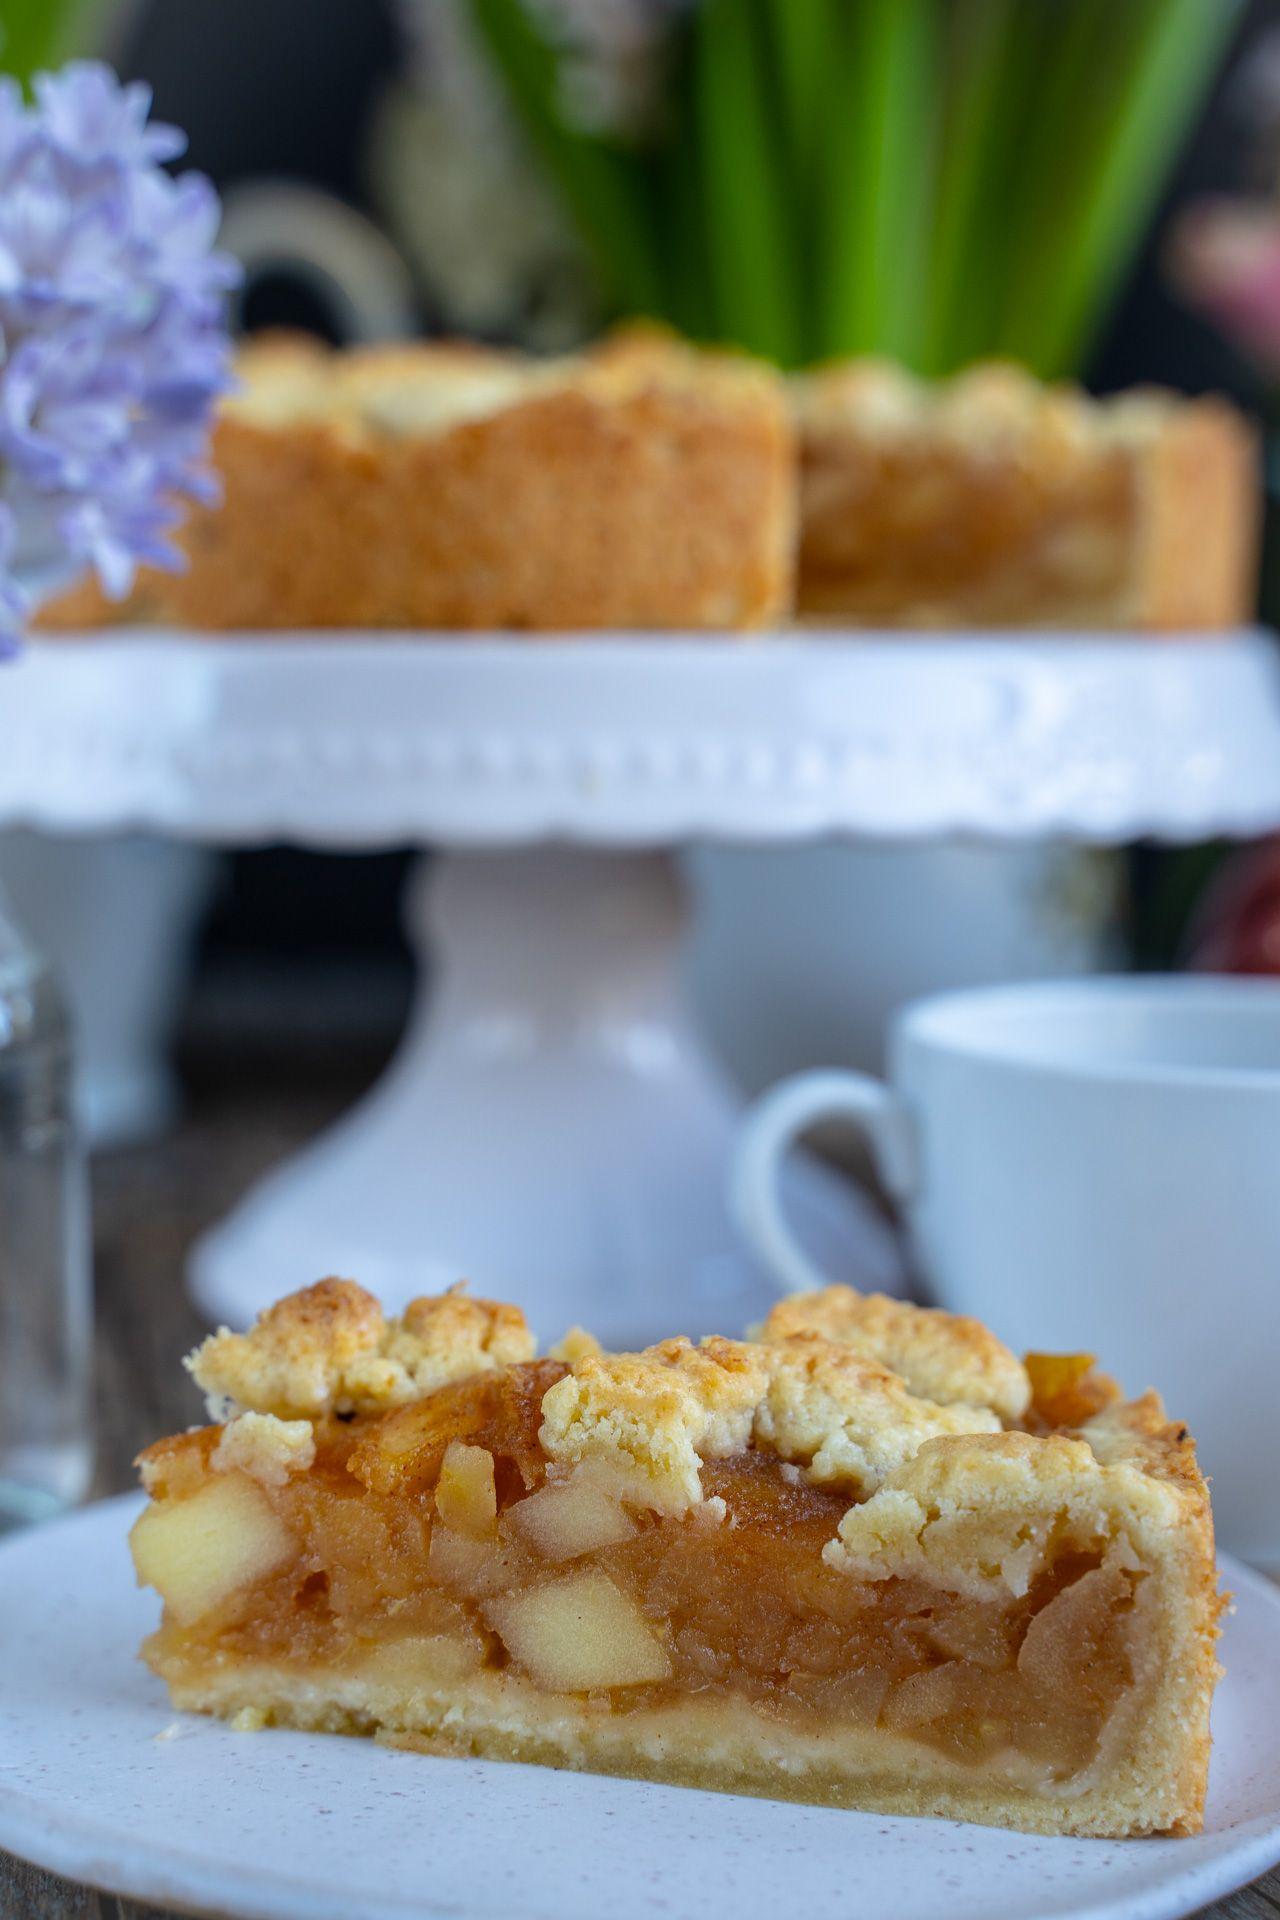 Apfel Streusel Kuchen Vegan 6 Zutaten Rezept Rezept In 2020 Kuchen Und Torten Rezepte Streusel Kuchen Streuselkuchen Rezept